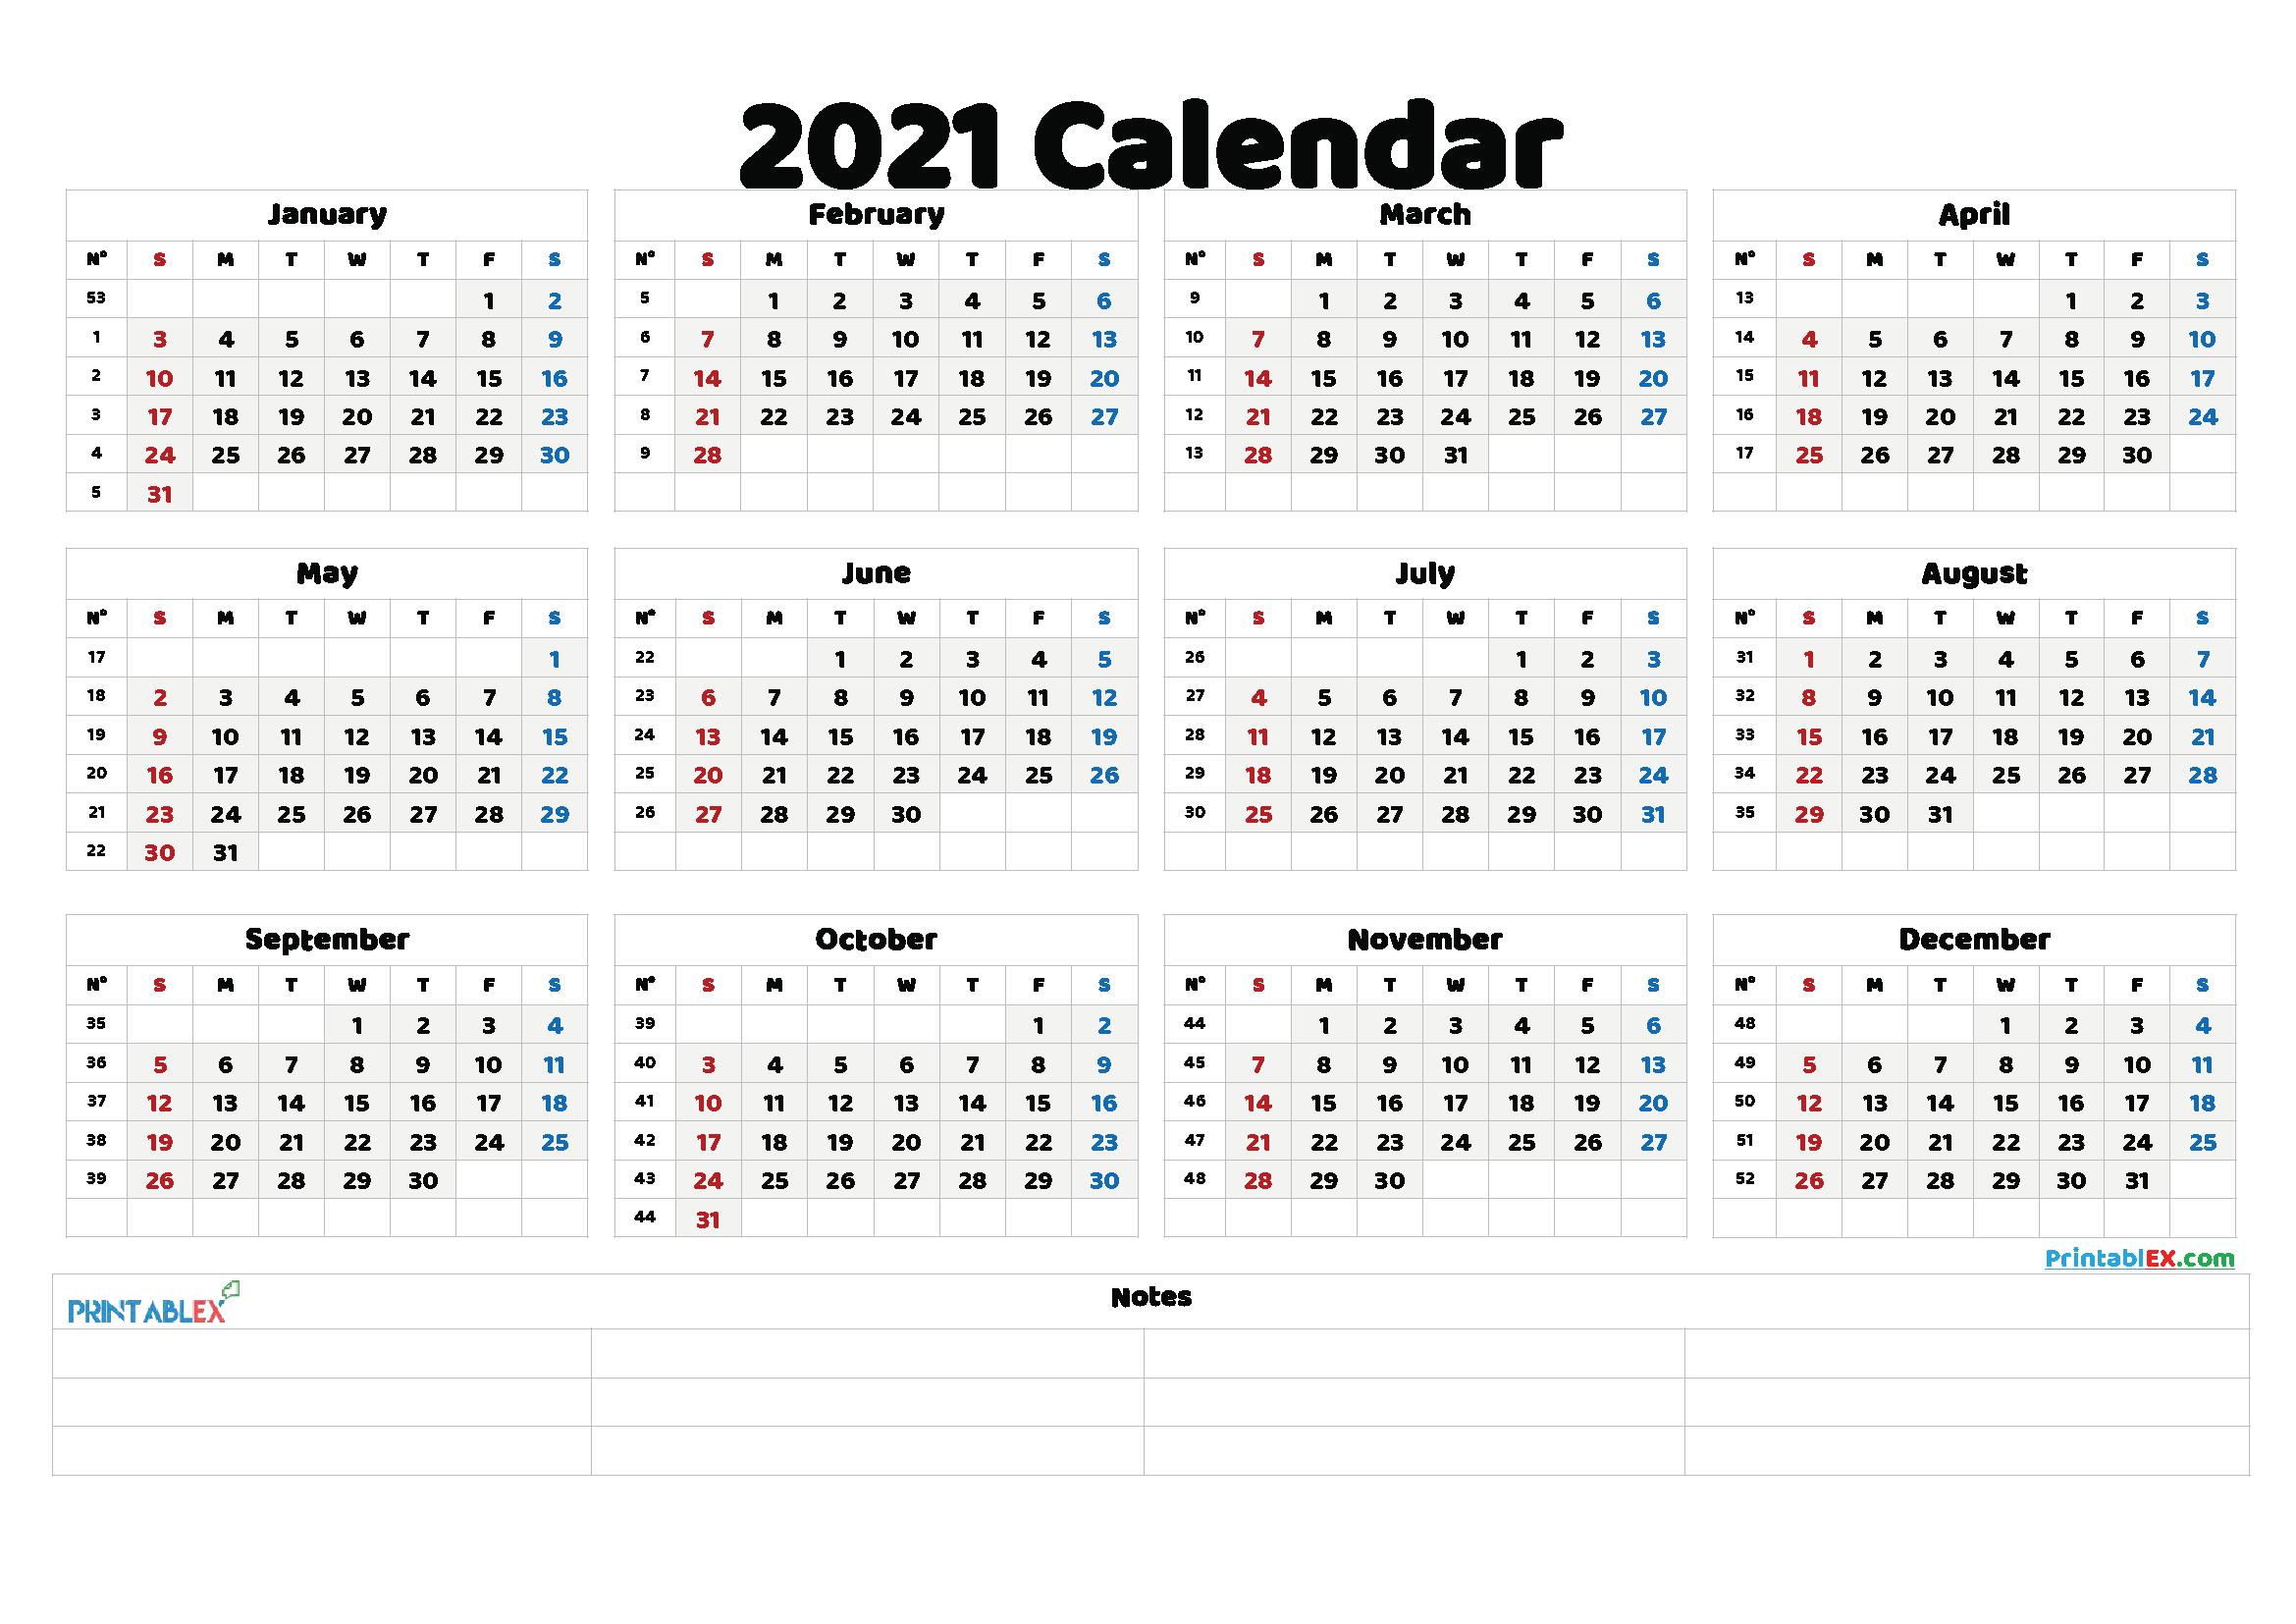 Free Printable 2021 Yearly Calendar with Week Numbers ...